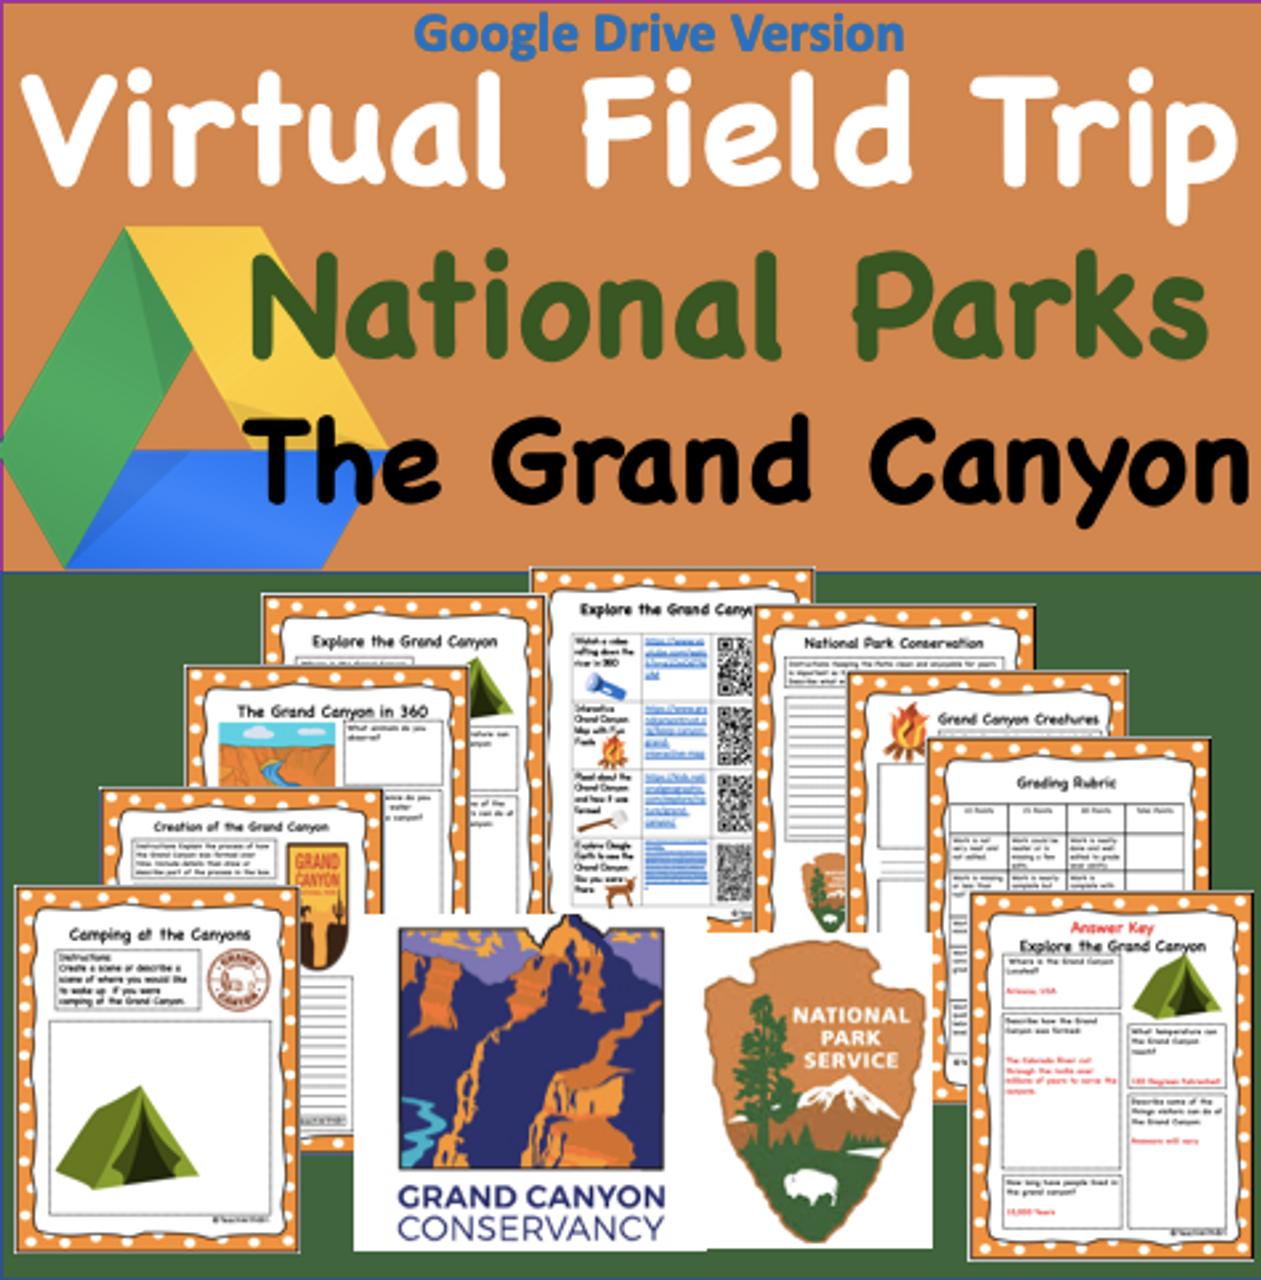 Google Drive Version- Grand Canyon National Parks Virtual Field Trip